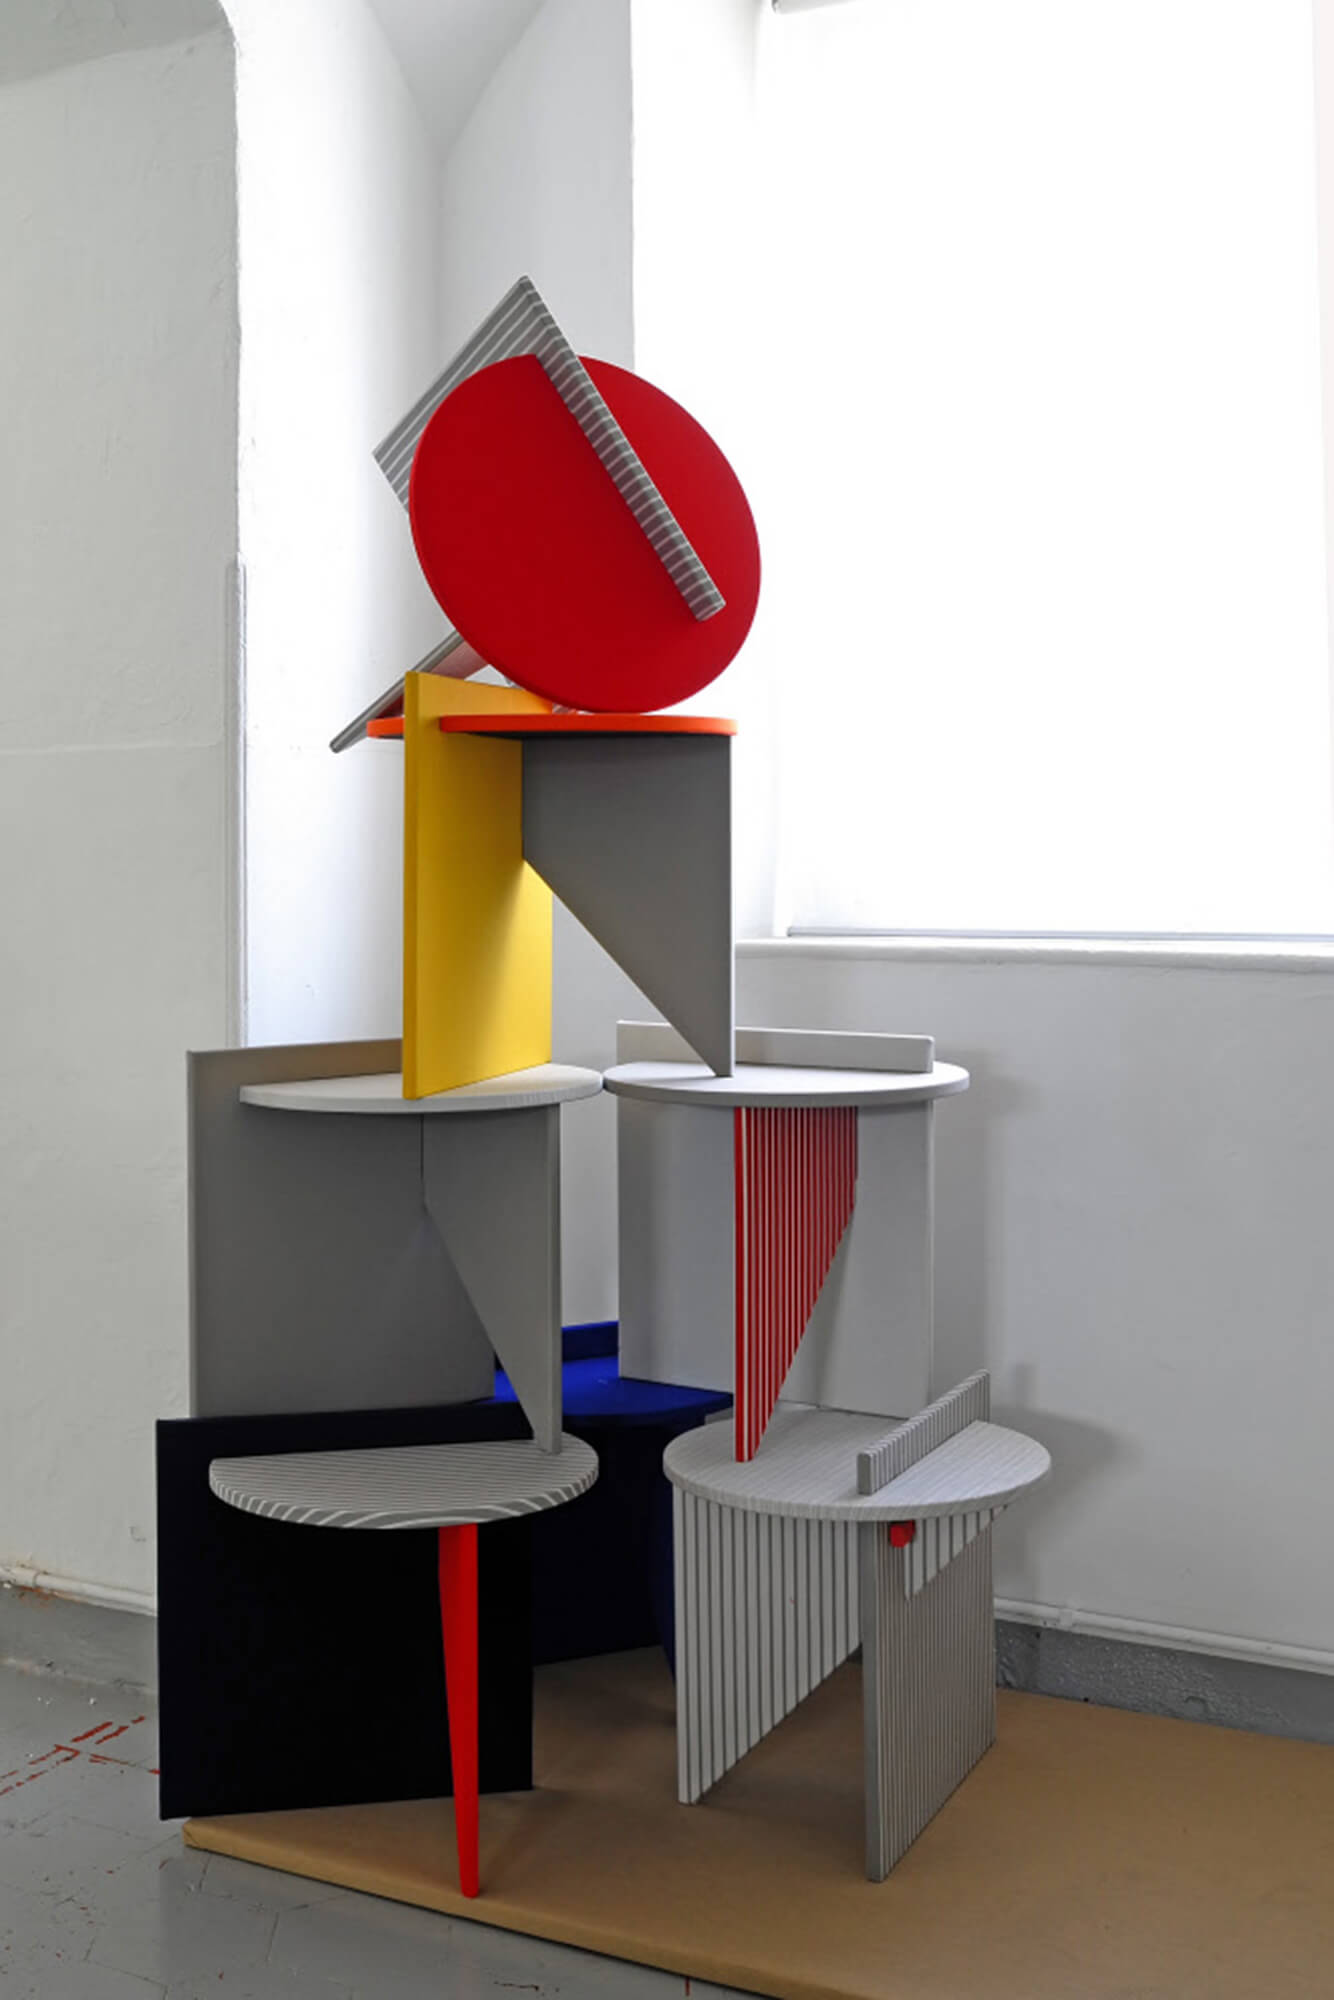 Rosana Orlandi 美术馆里,堆叠着 Atelier Lavit 设计的亮色边桌